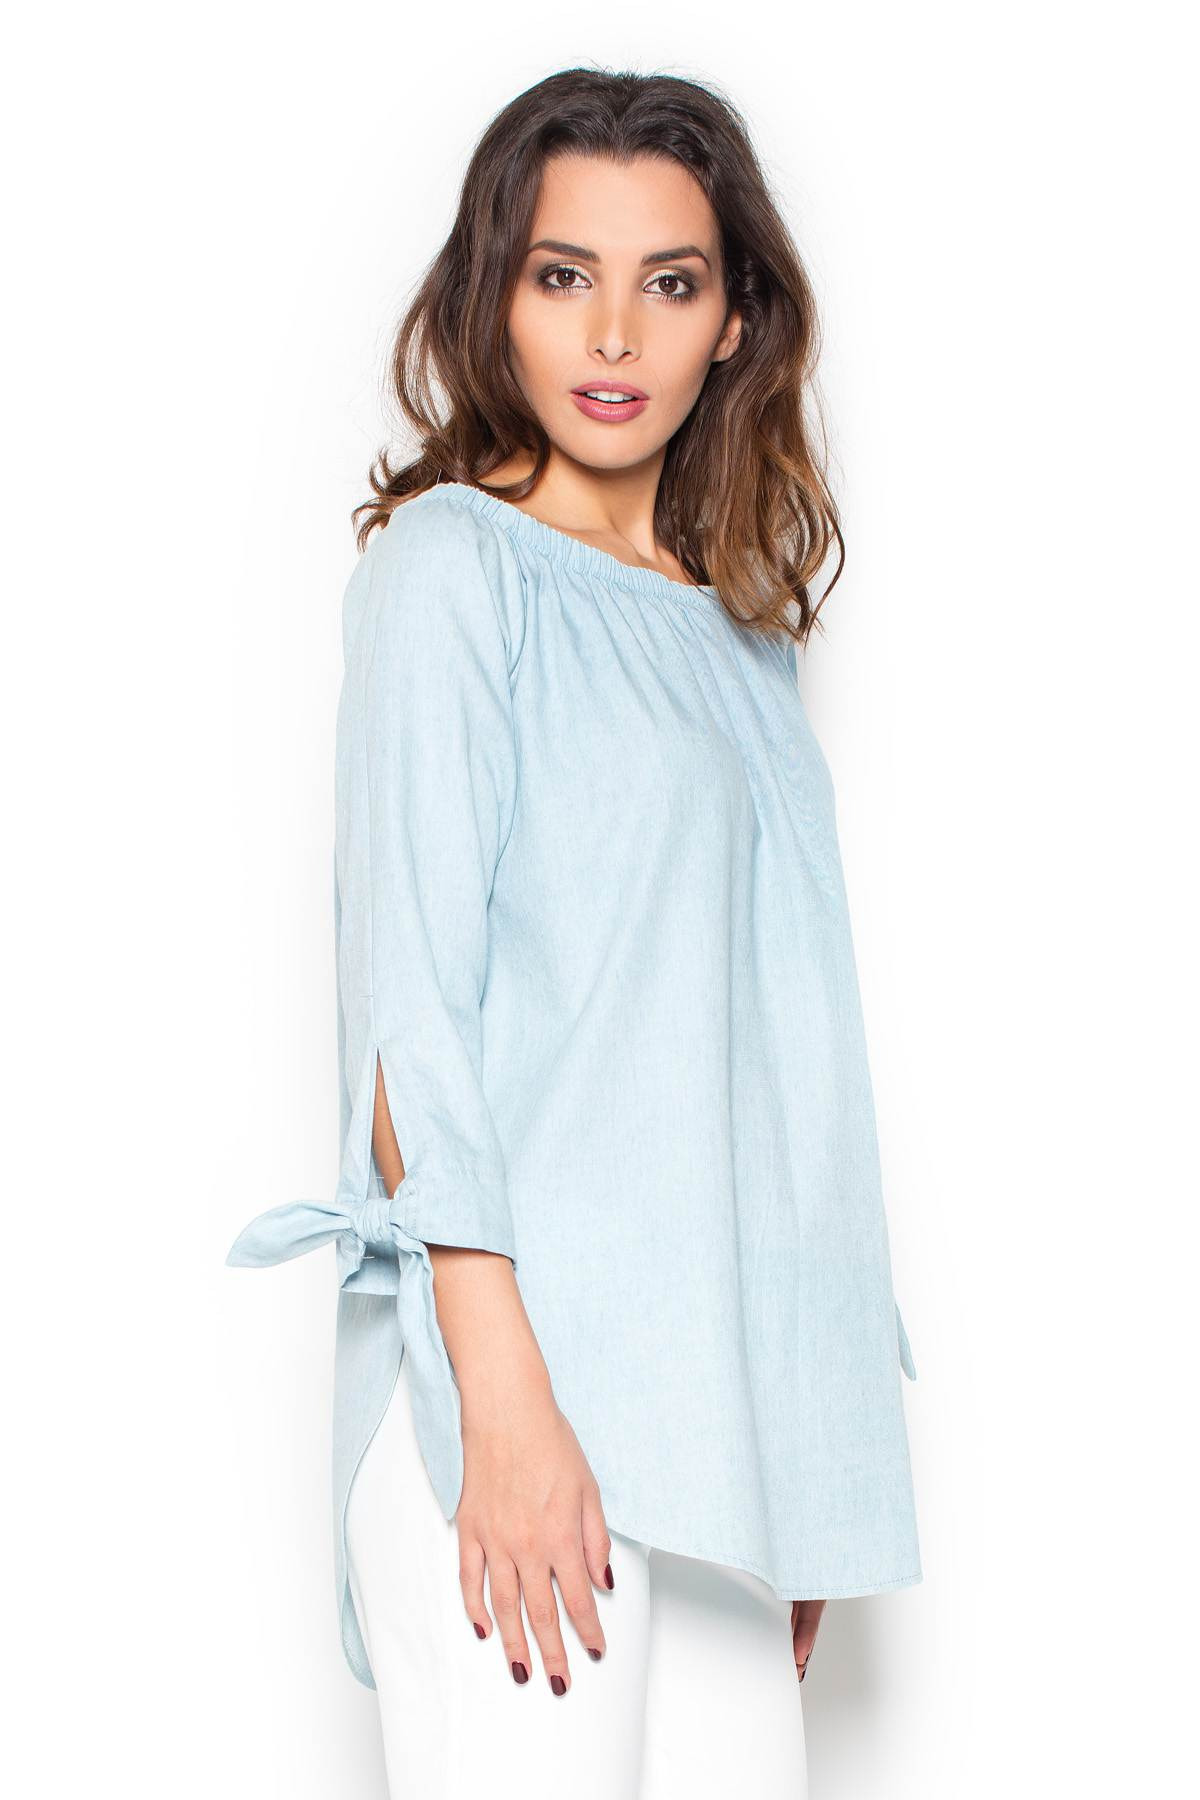 KATRUS γυναικεια τζιν μπλουζα